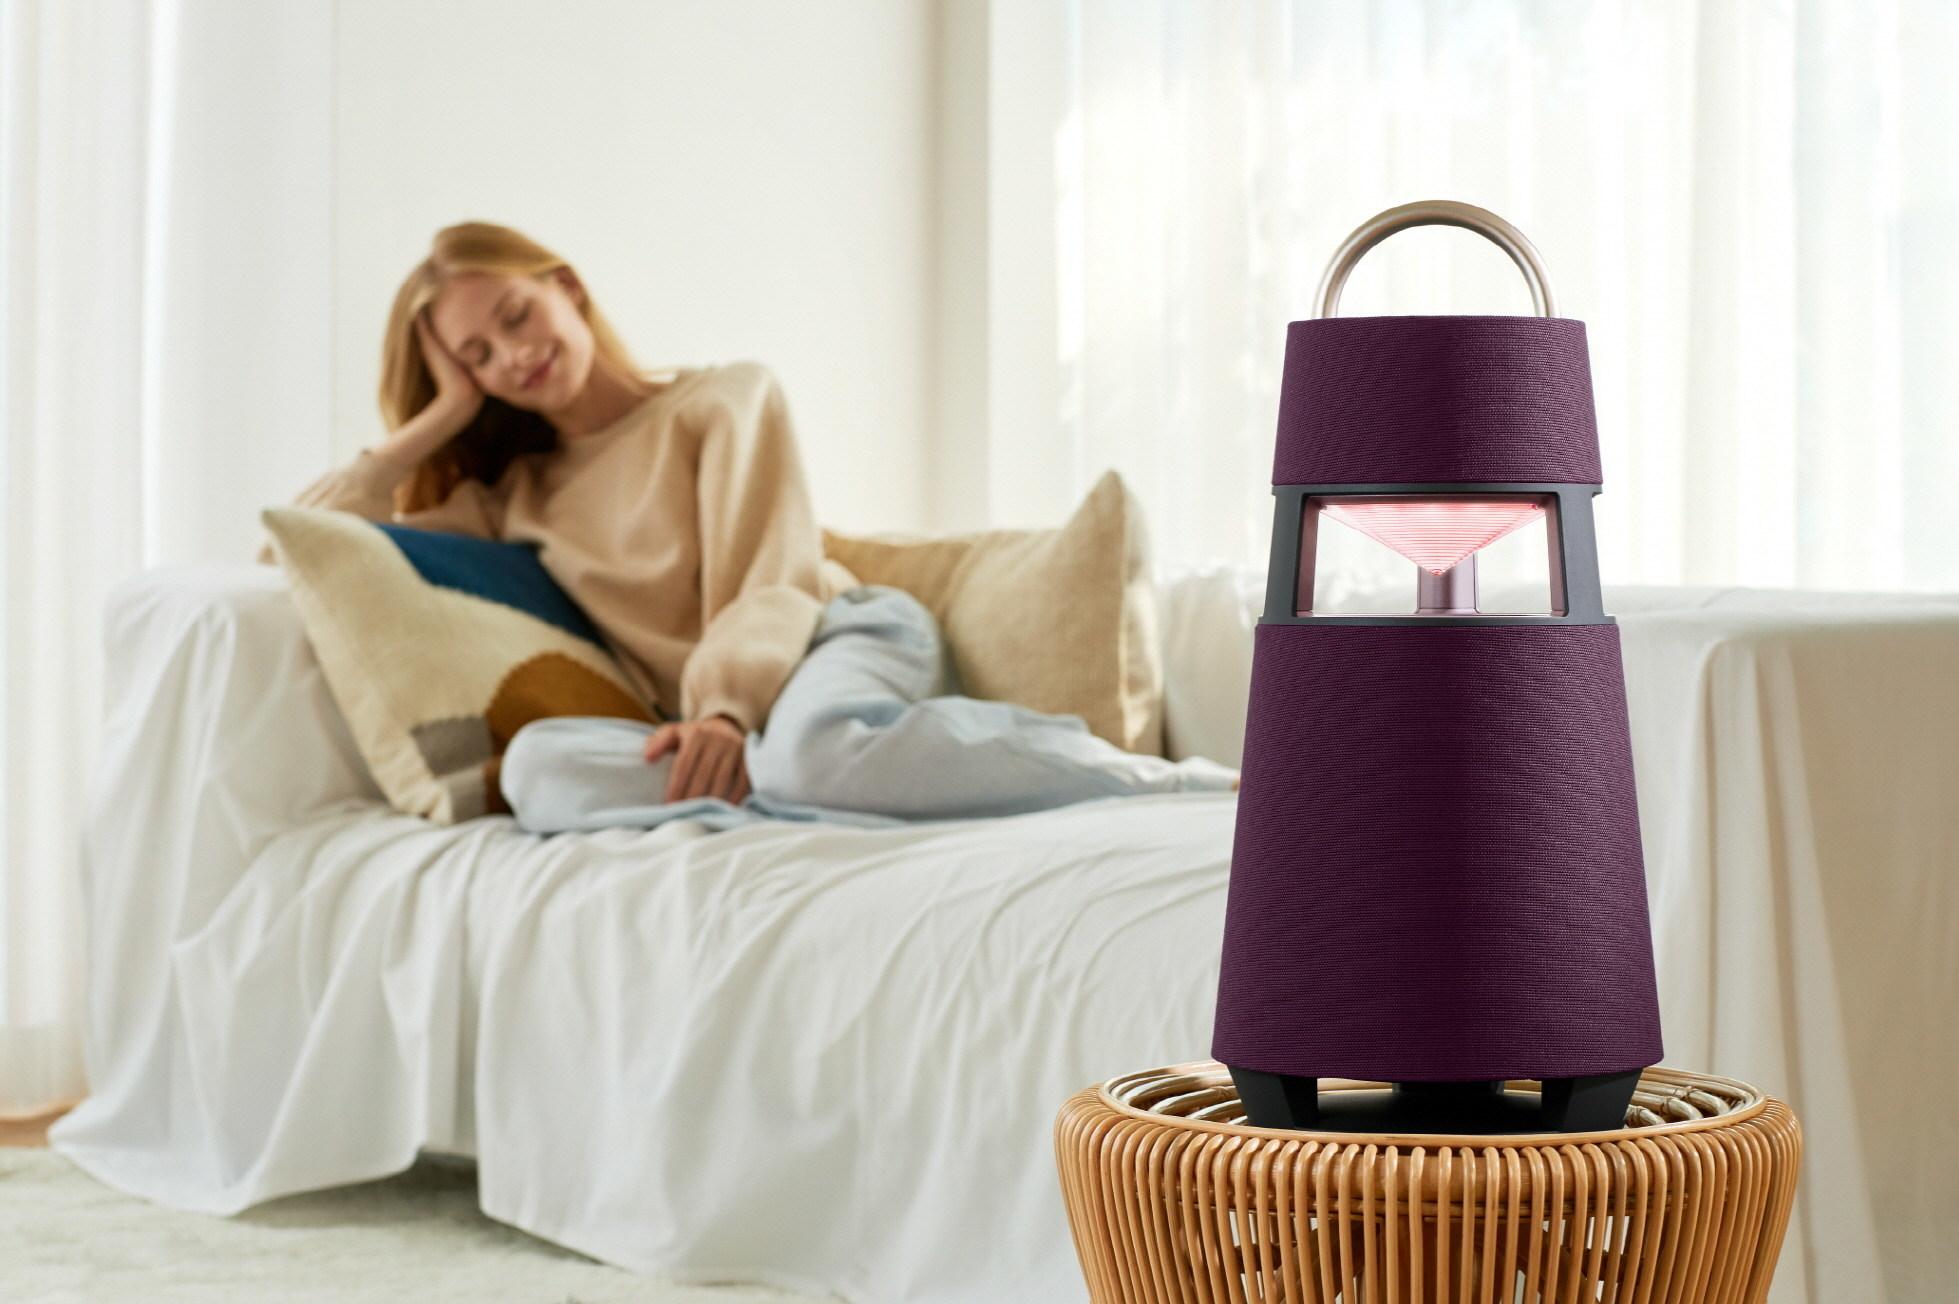 LG Announces US Debut Of XBOOM 360 Omnidirectional Premium Bluetooth Speaker